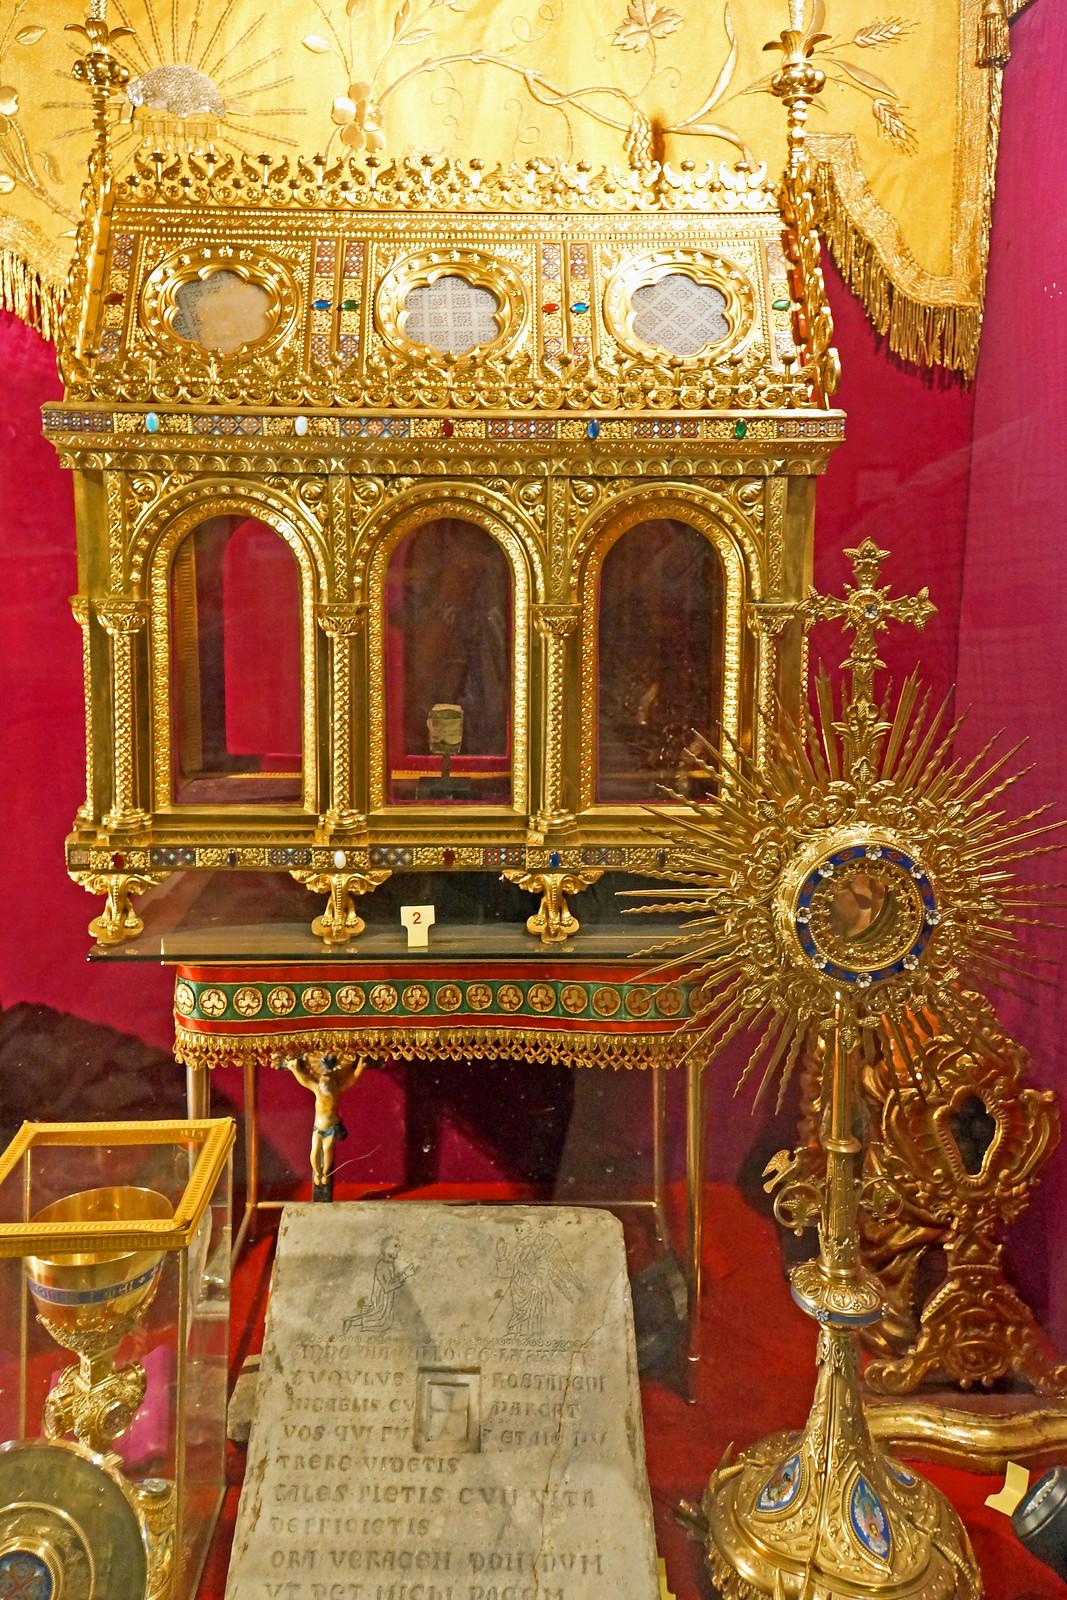 France-002819 - Relics